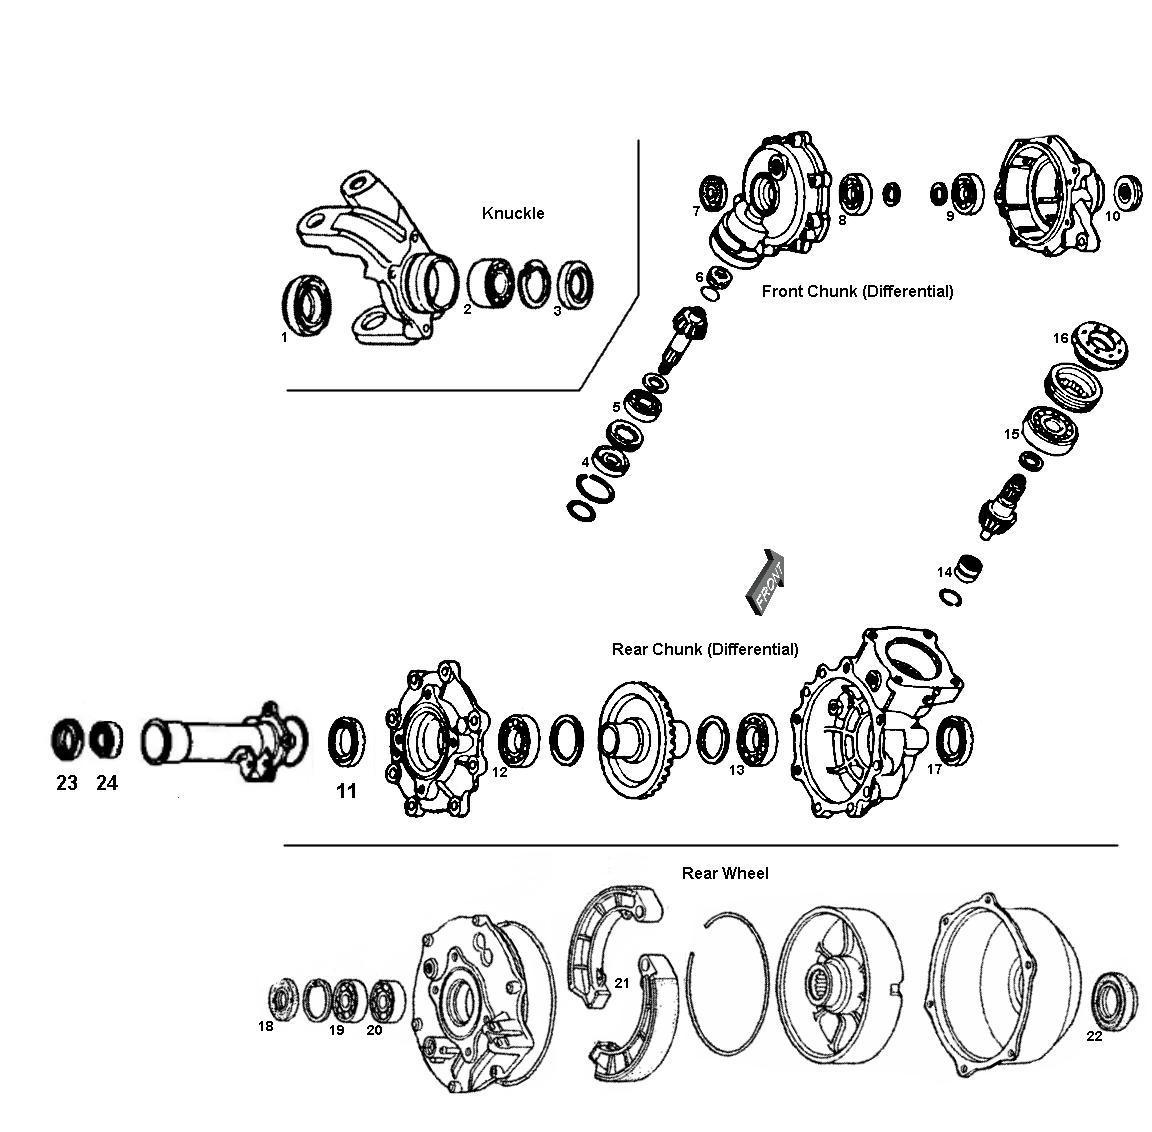 Frony Weel Honda Foreman 400 Parts Diagram • Wiring